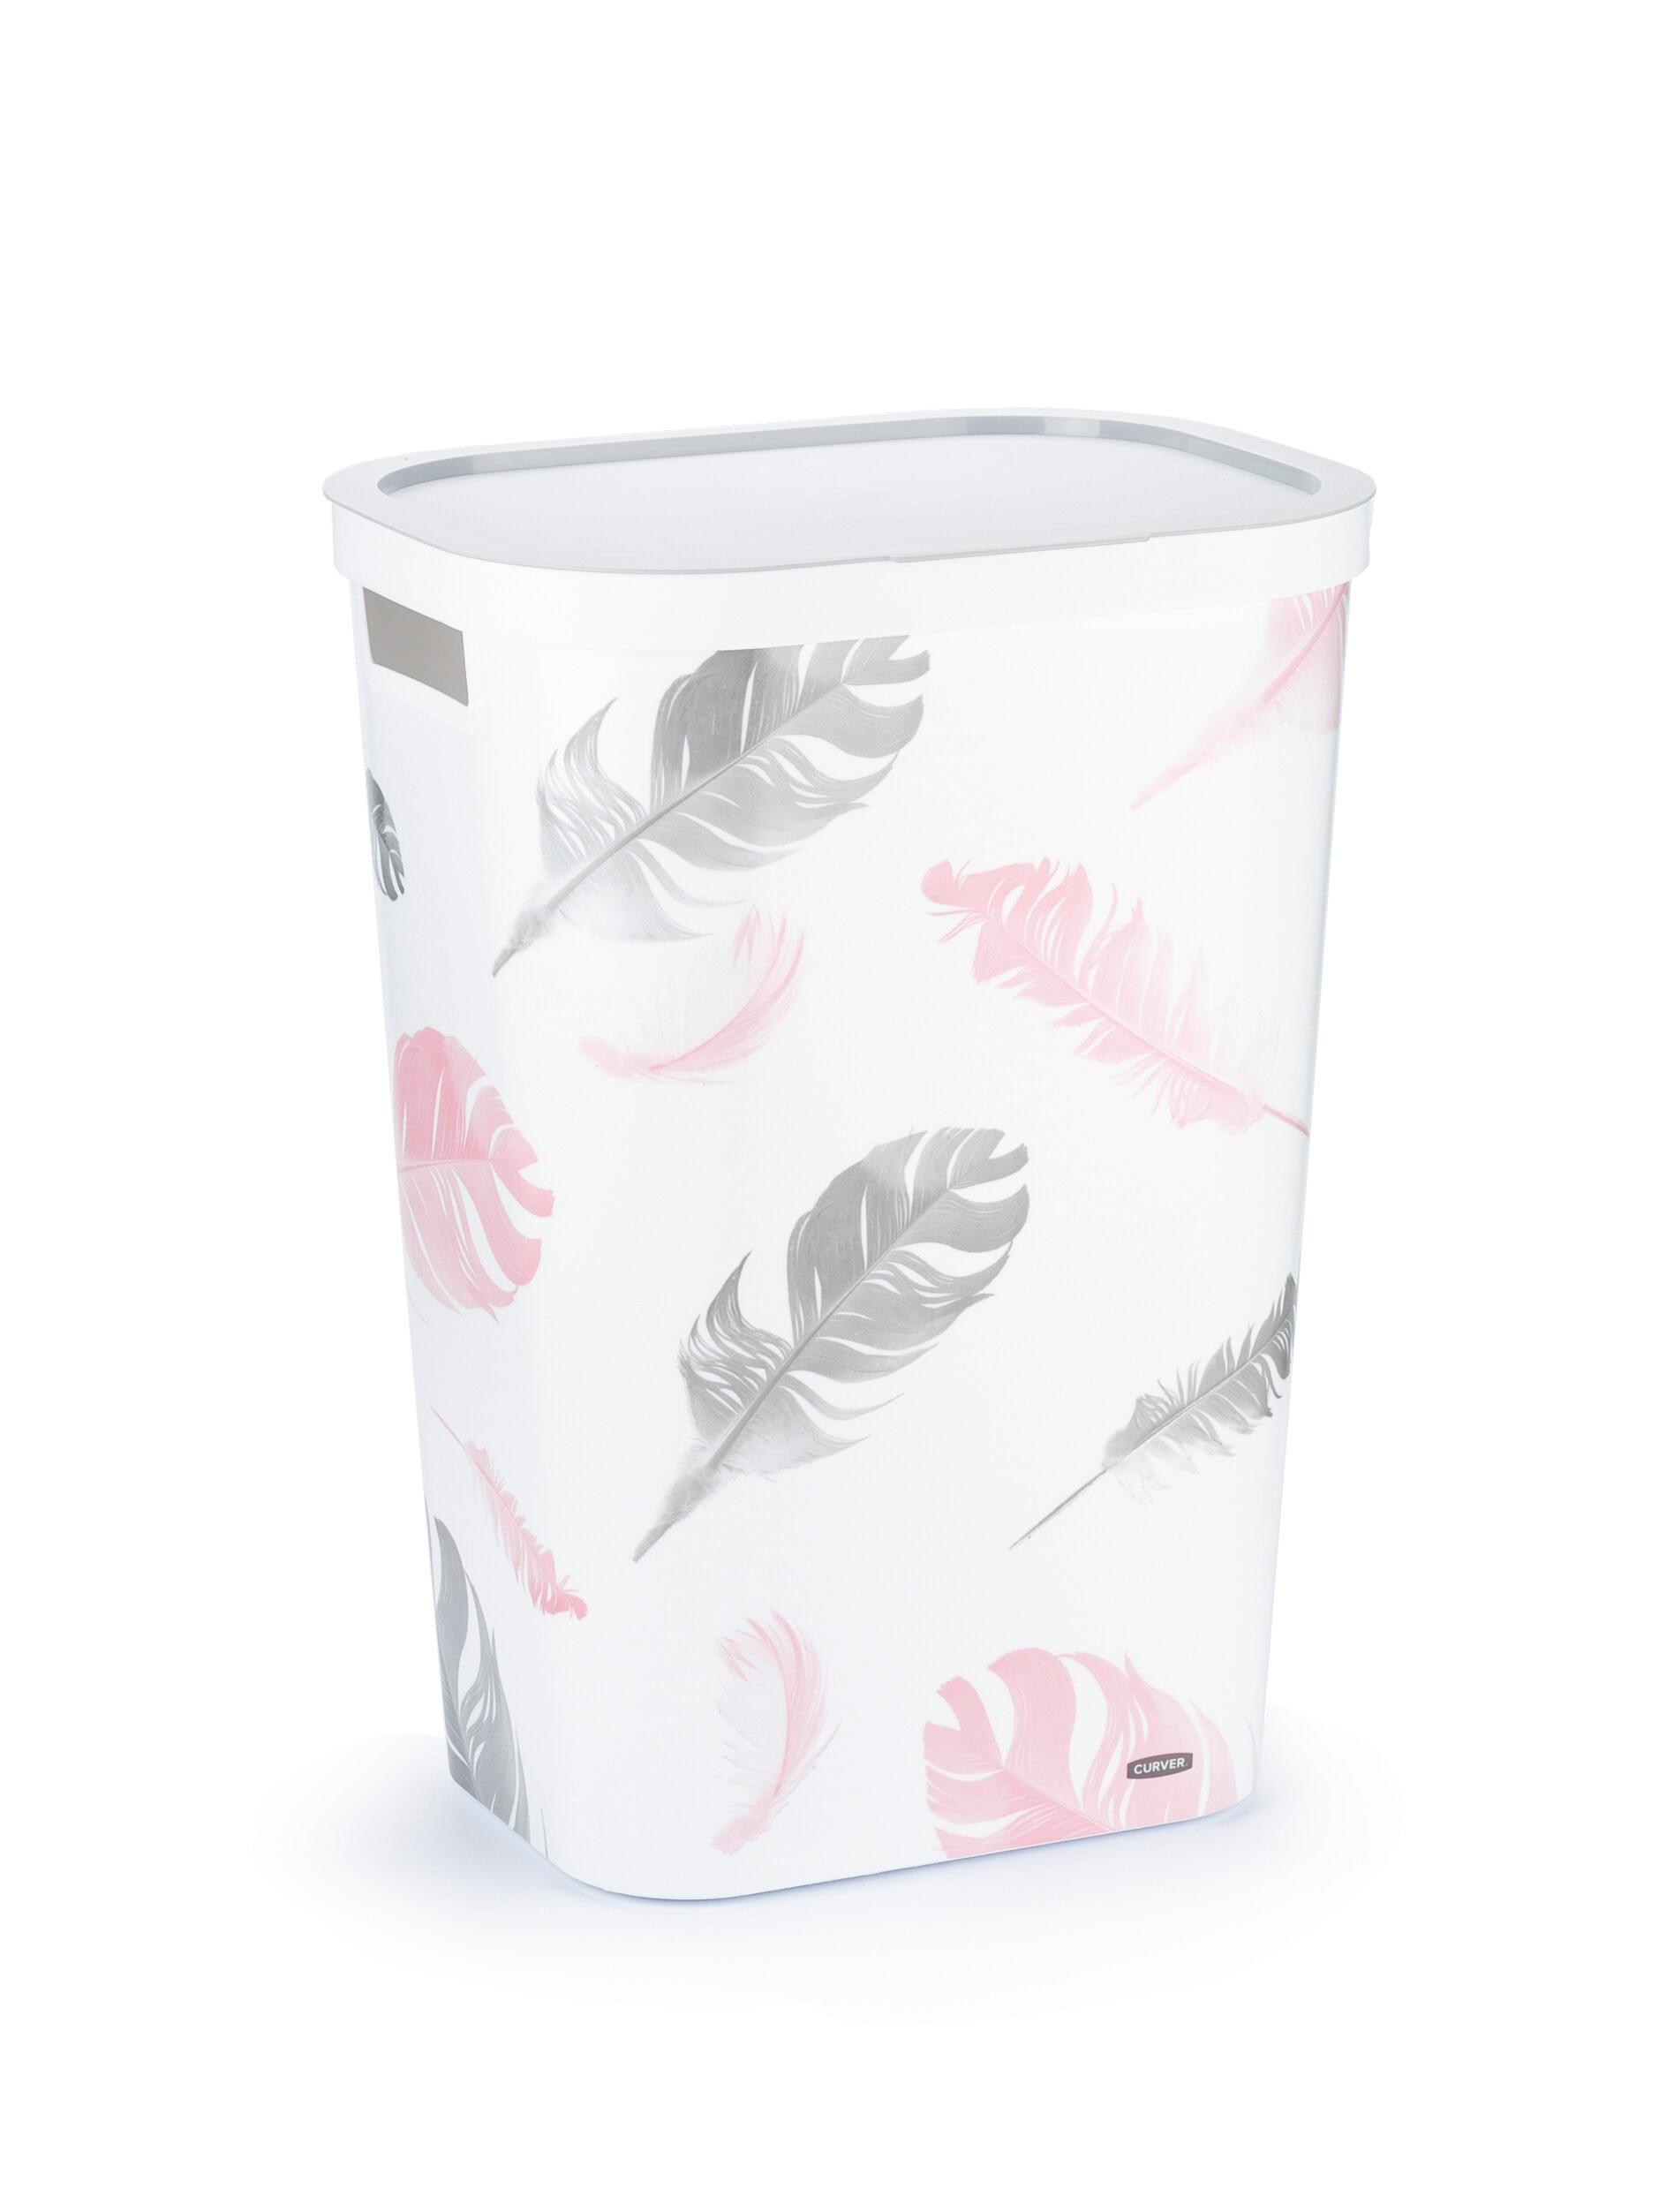 Laundry basket CURVER INFINITY Feathers 60 L корзина для белья curver infinity feathers 60 л